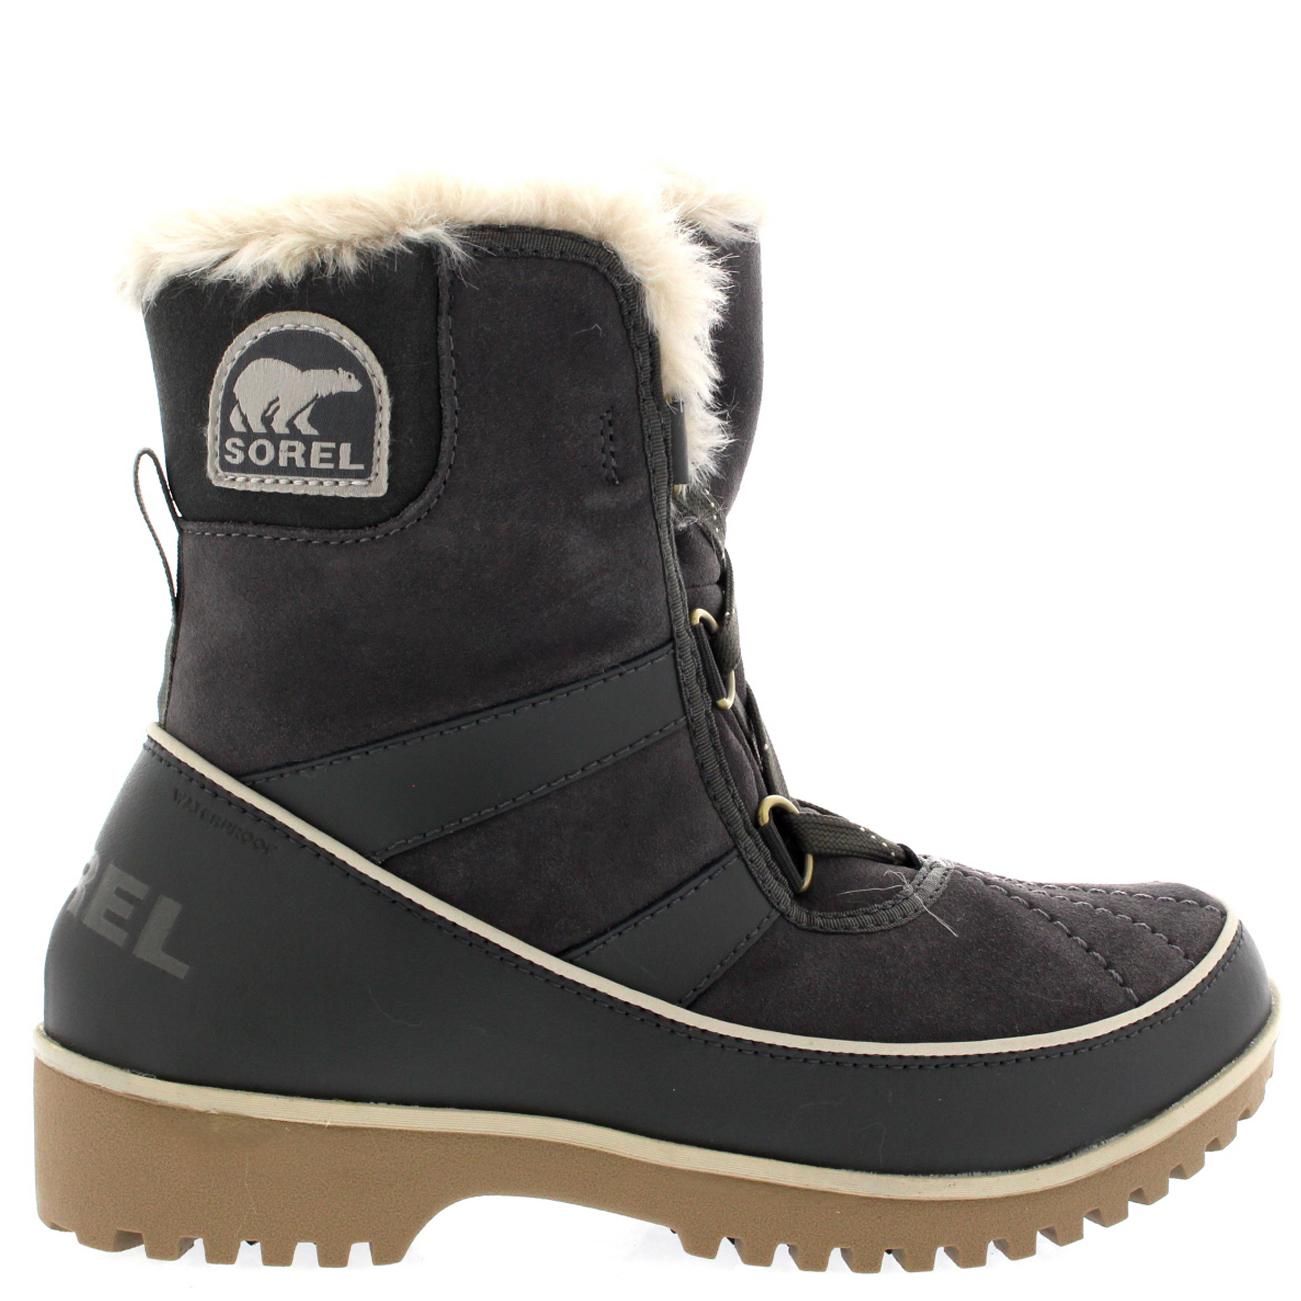 Womens Sorel Tivoli II Fur Lined Lace Up Rain Winter Snow Mid Calf Boots